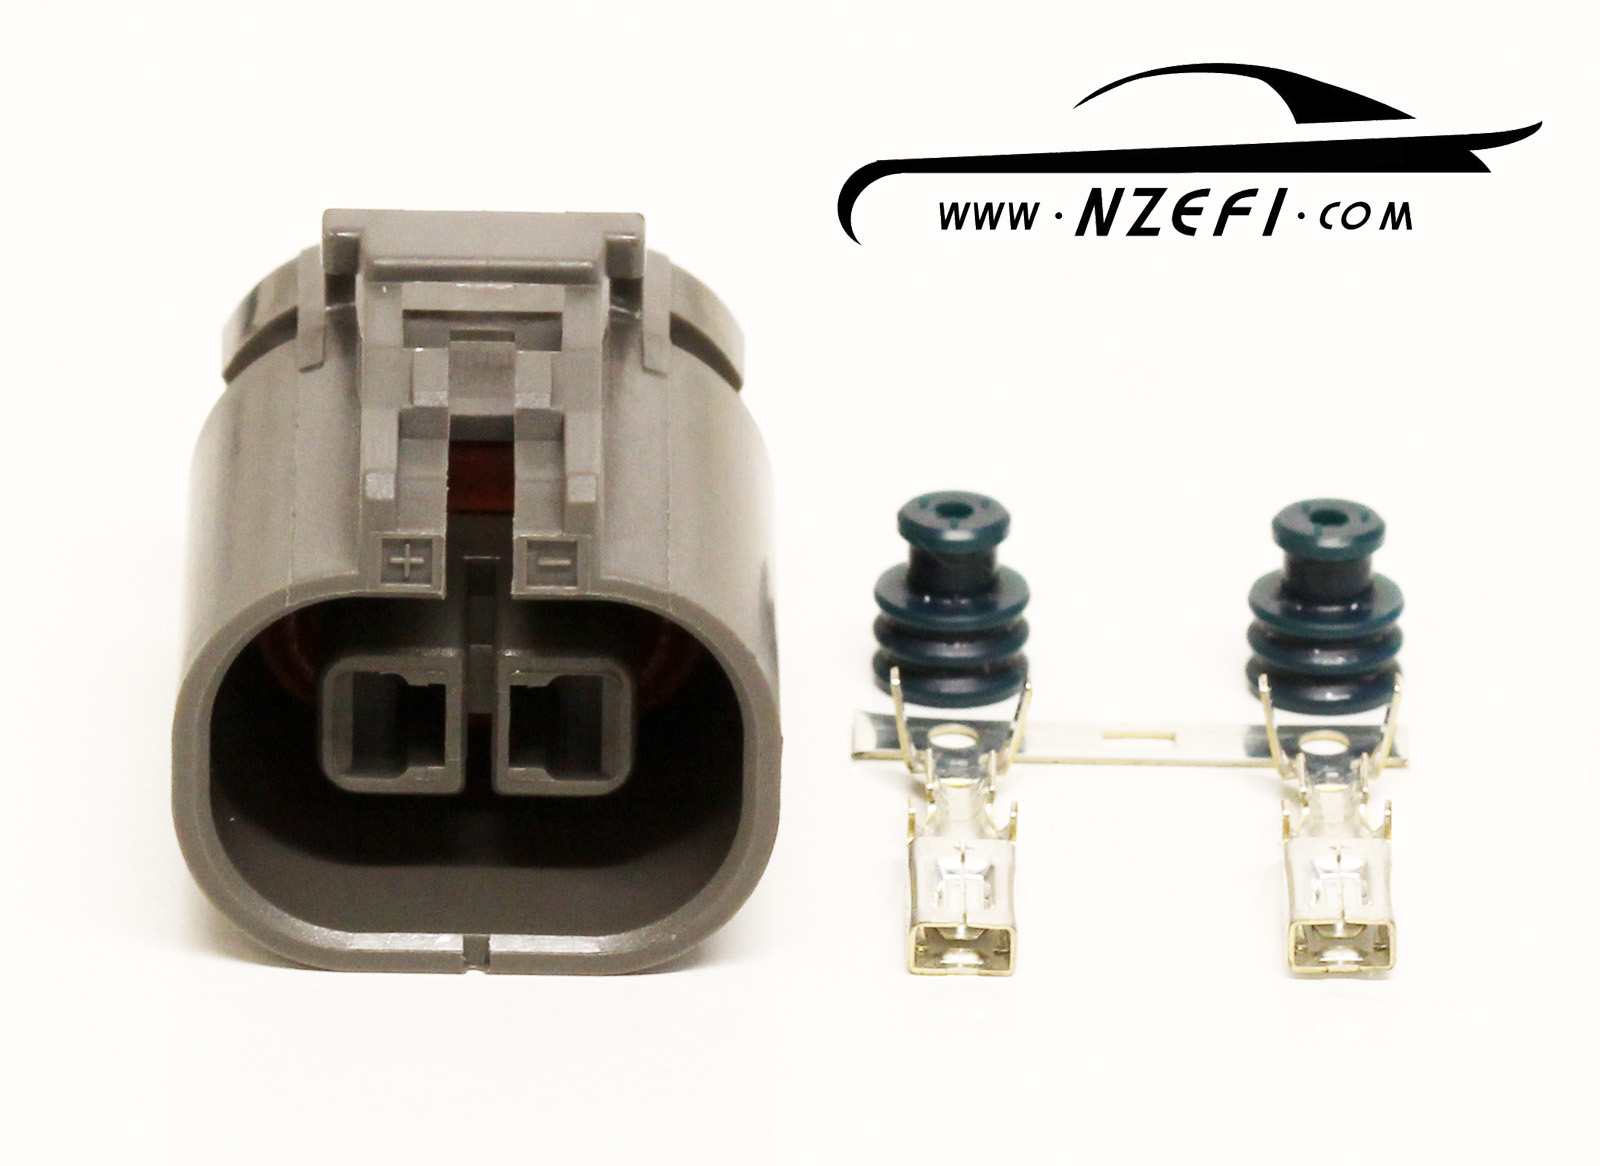 Nissan Fuel Pump Cradle Connector R32 Gtr R33 S14 Nzefi Ford Wiring Pins 2 Pin